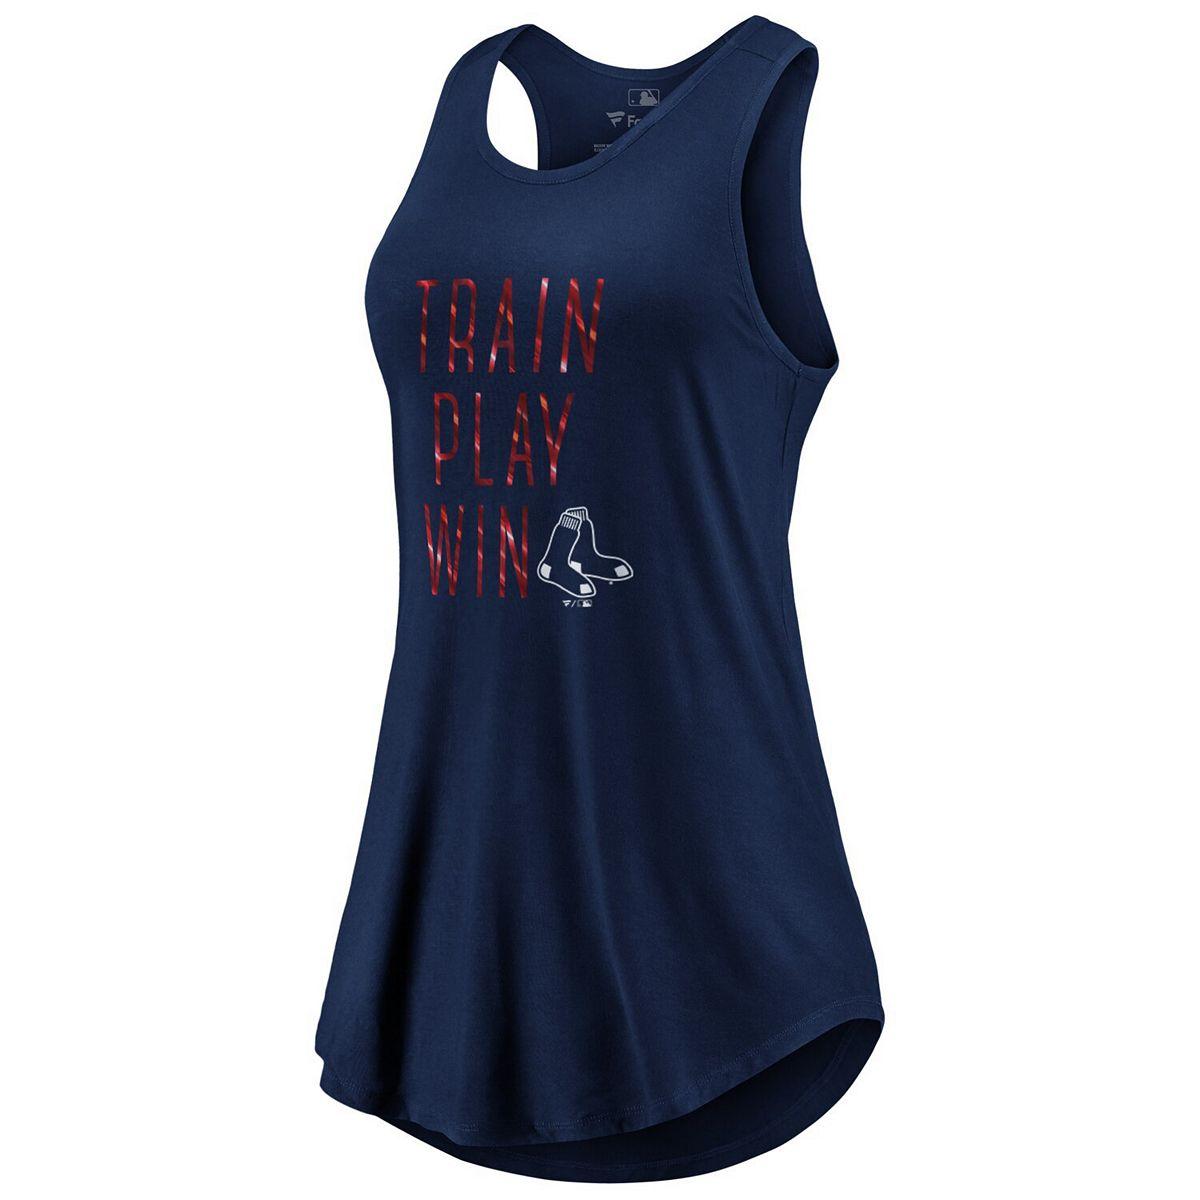 Women's Fanatics Branded Navy Boston Red Sox Train, Play, Win Tank Top M5gjH